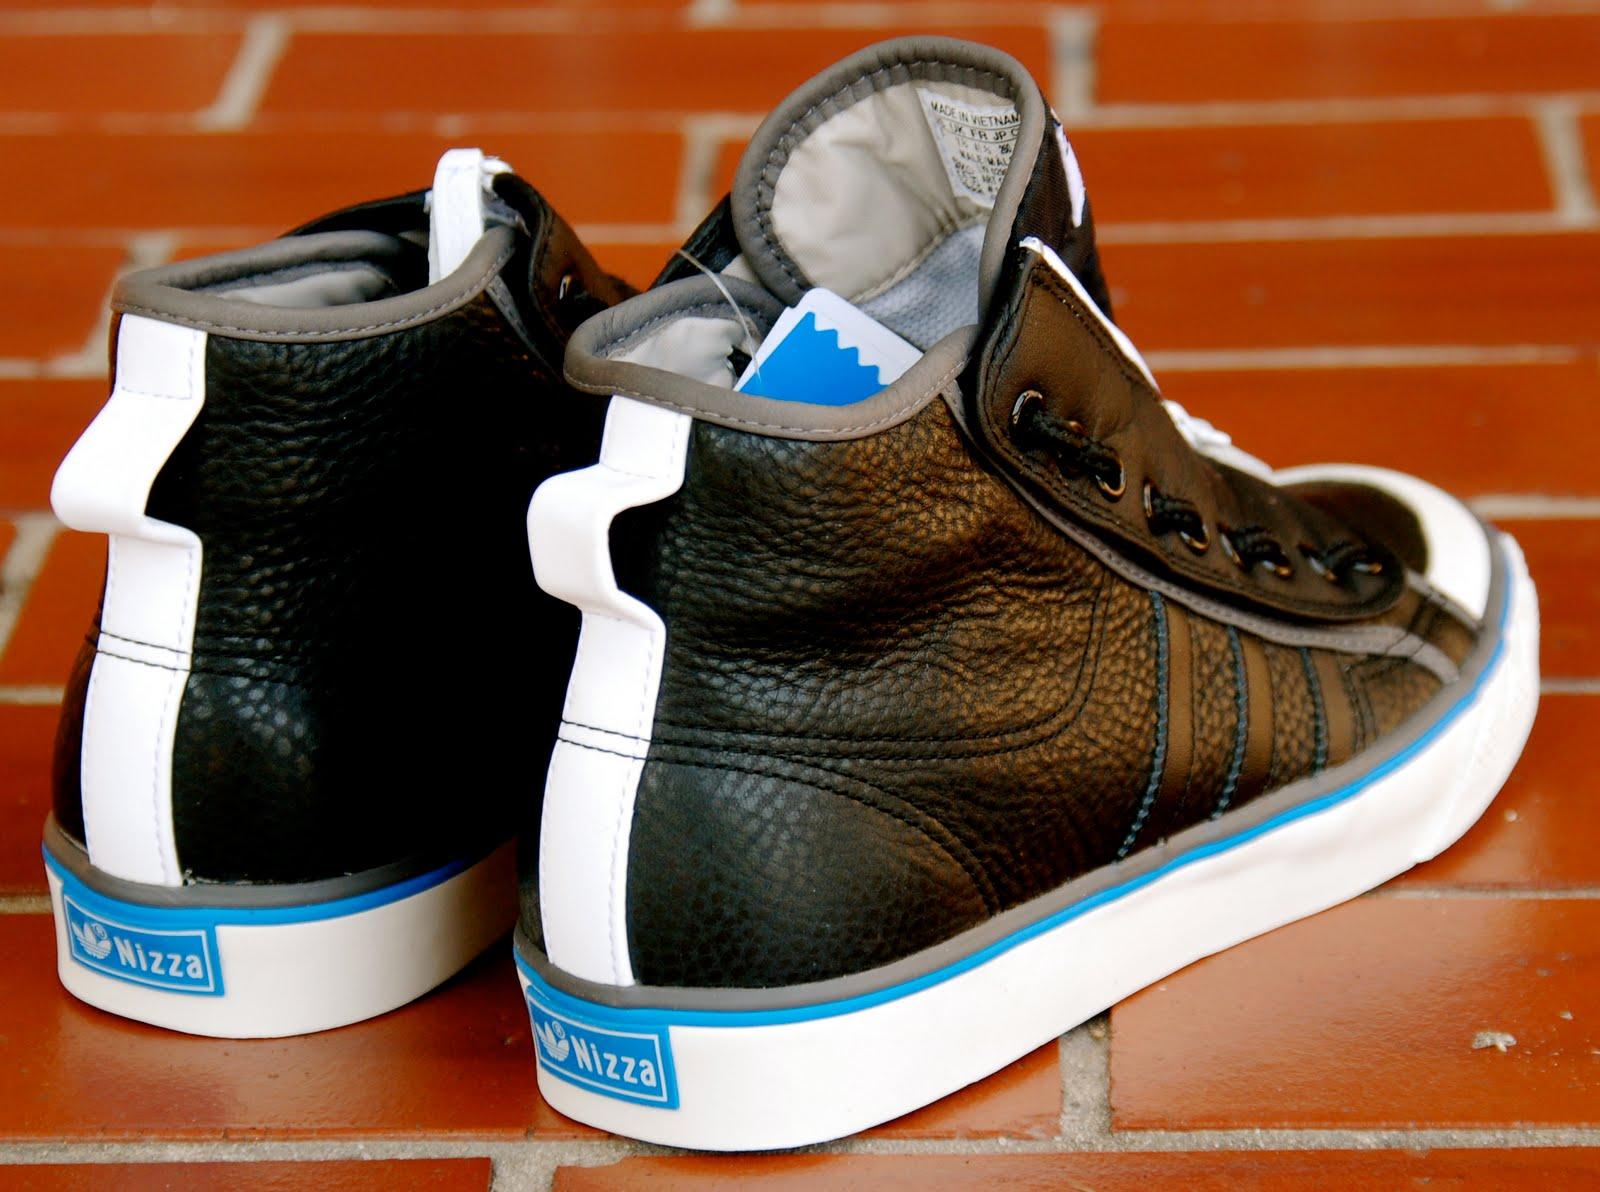 Sole Sneaker Boutique  Adidas Nizza Hi OT Tech c5ee9cf5a8c7